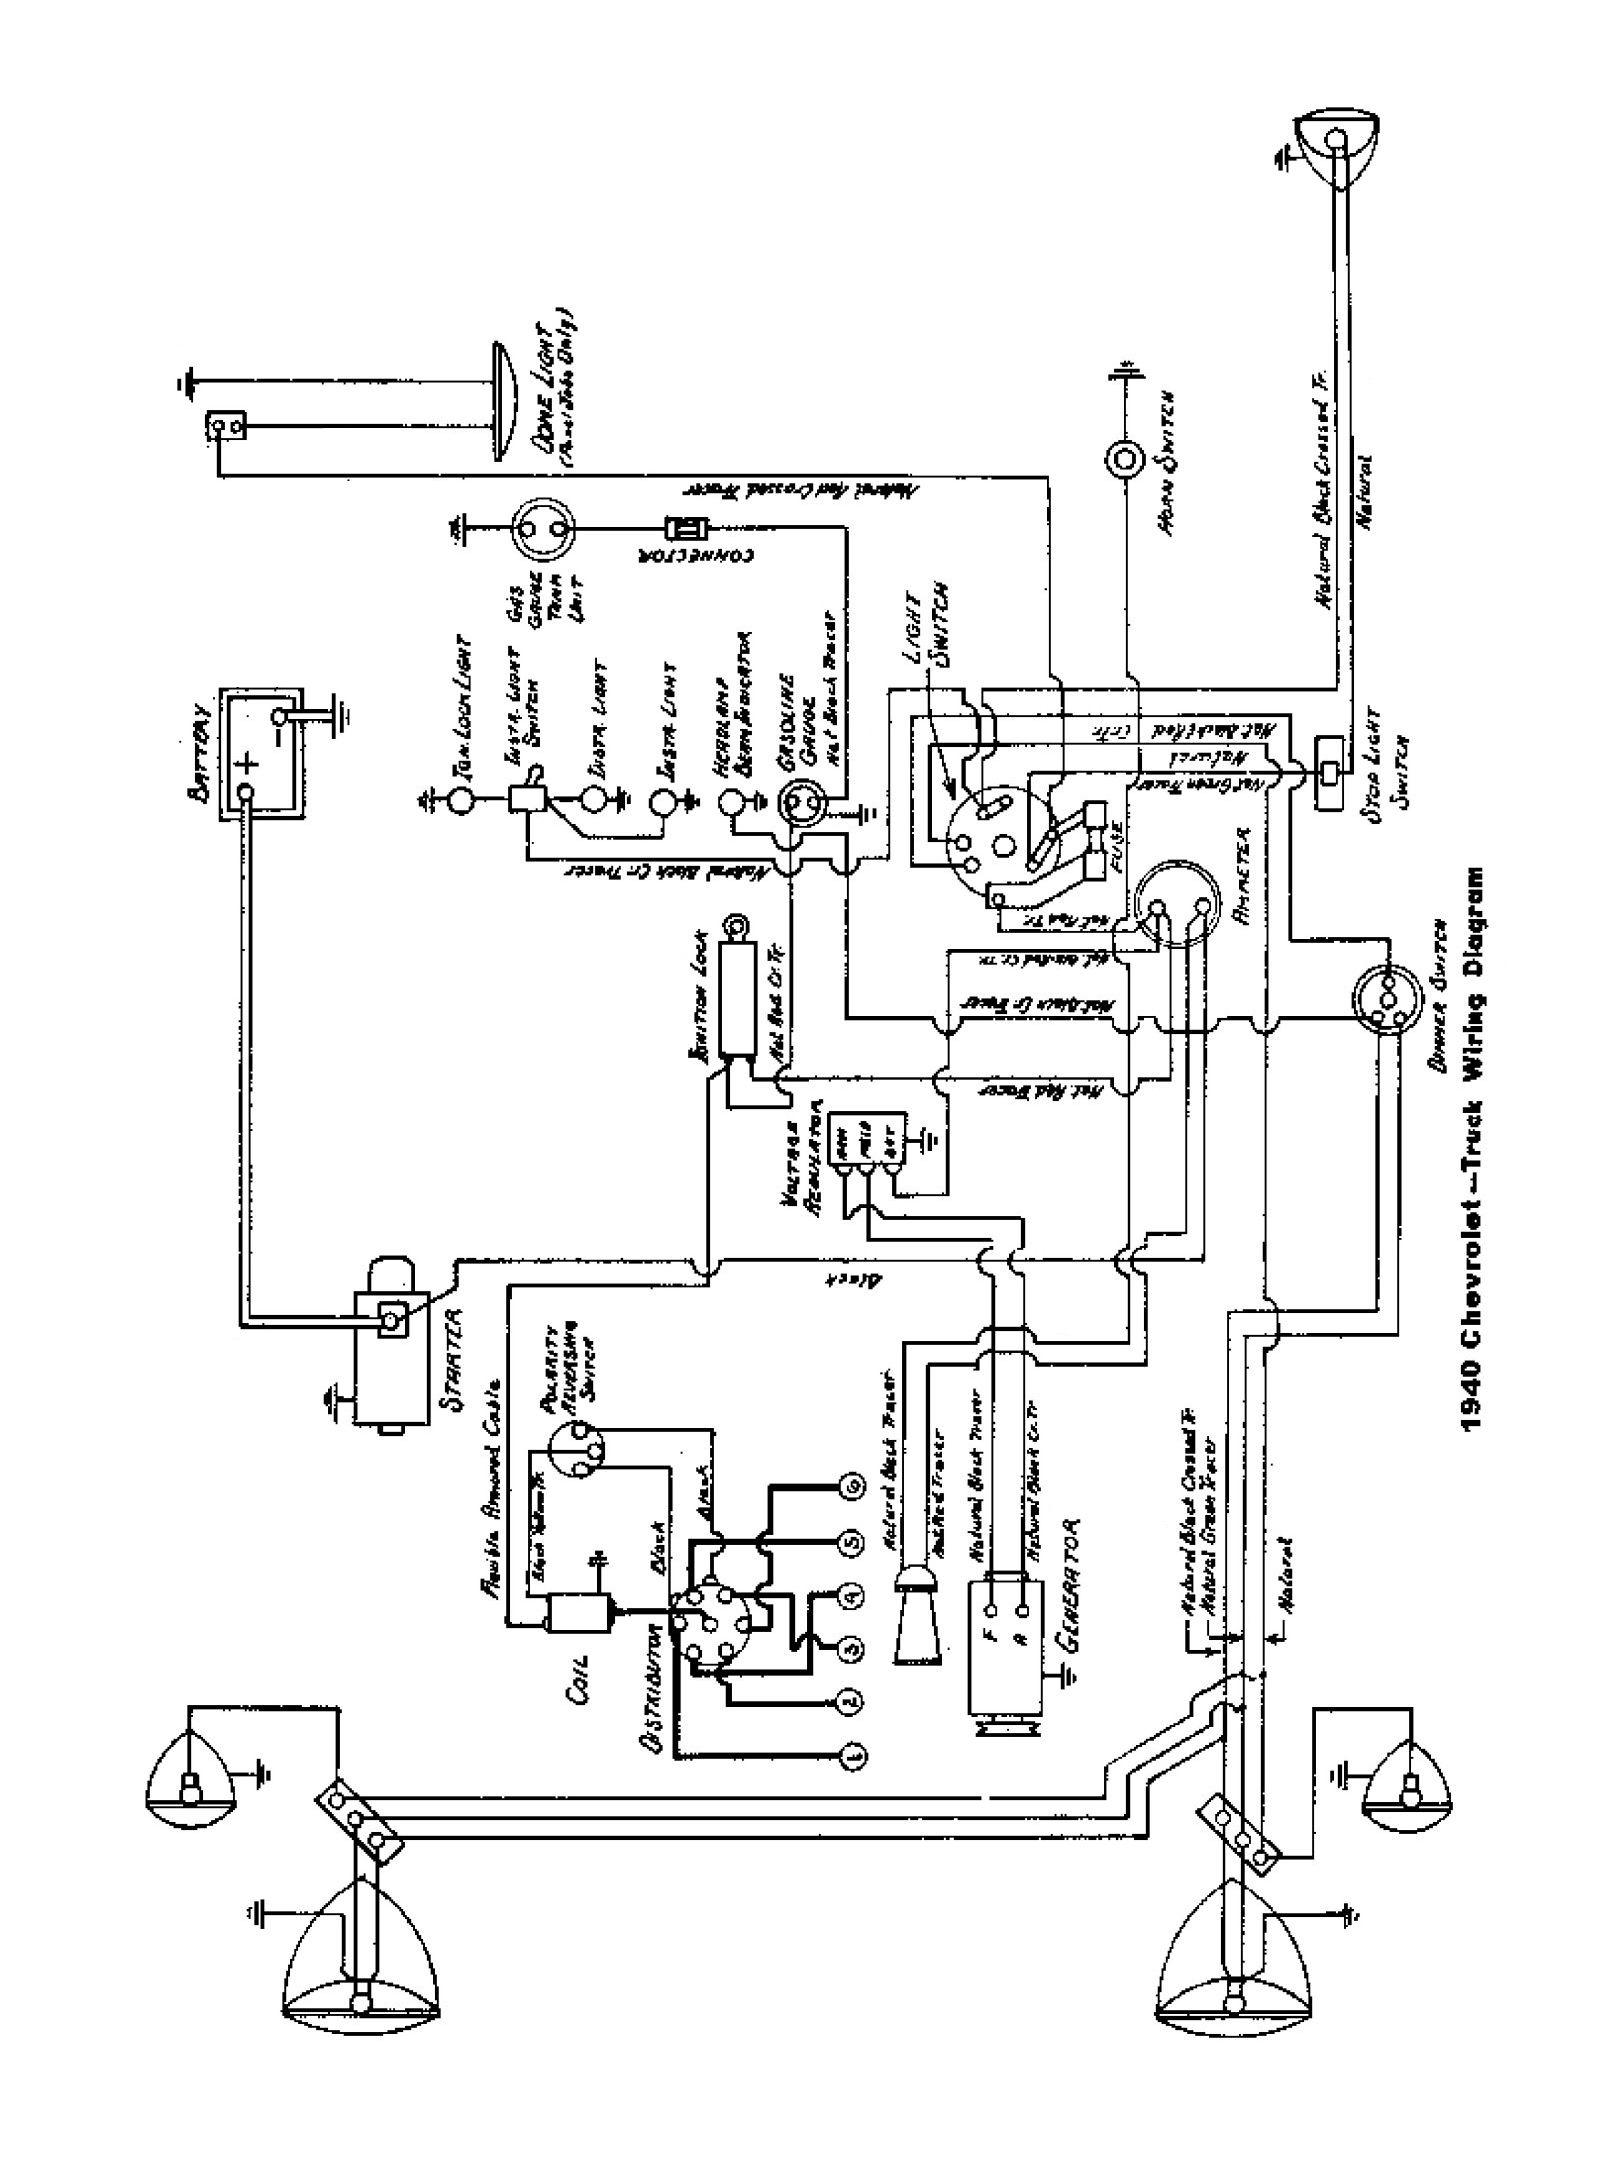 Cadillac Wiring  Schematic Engine Wiring Diagram - 1968 cadillac alternator wiring